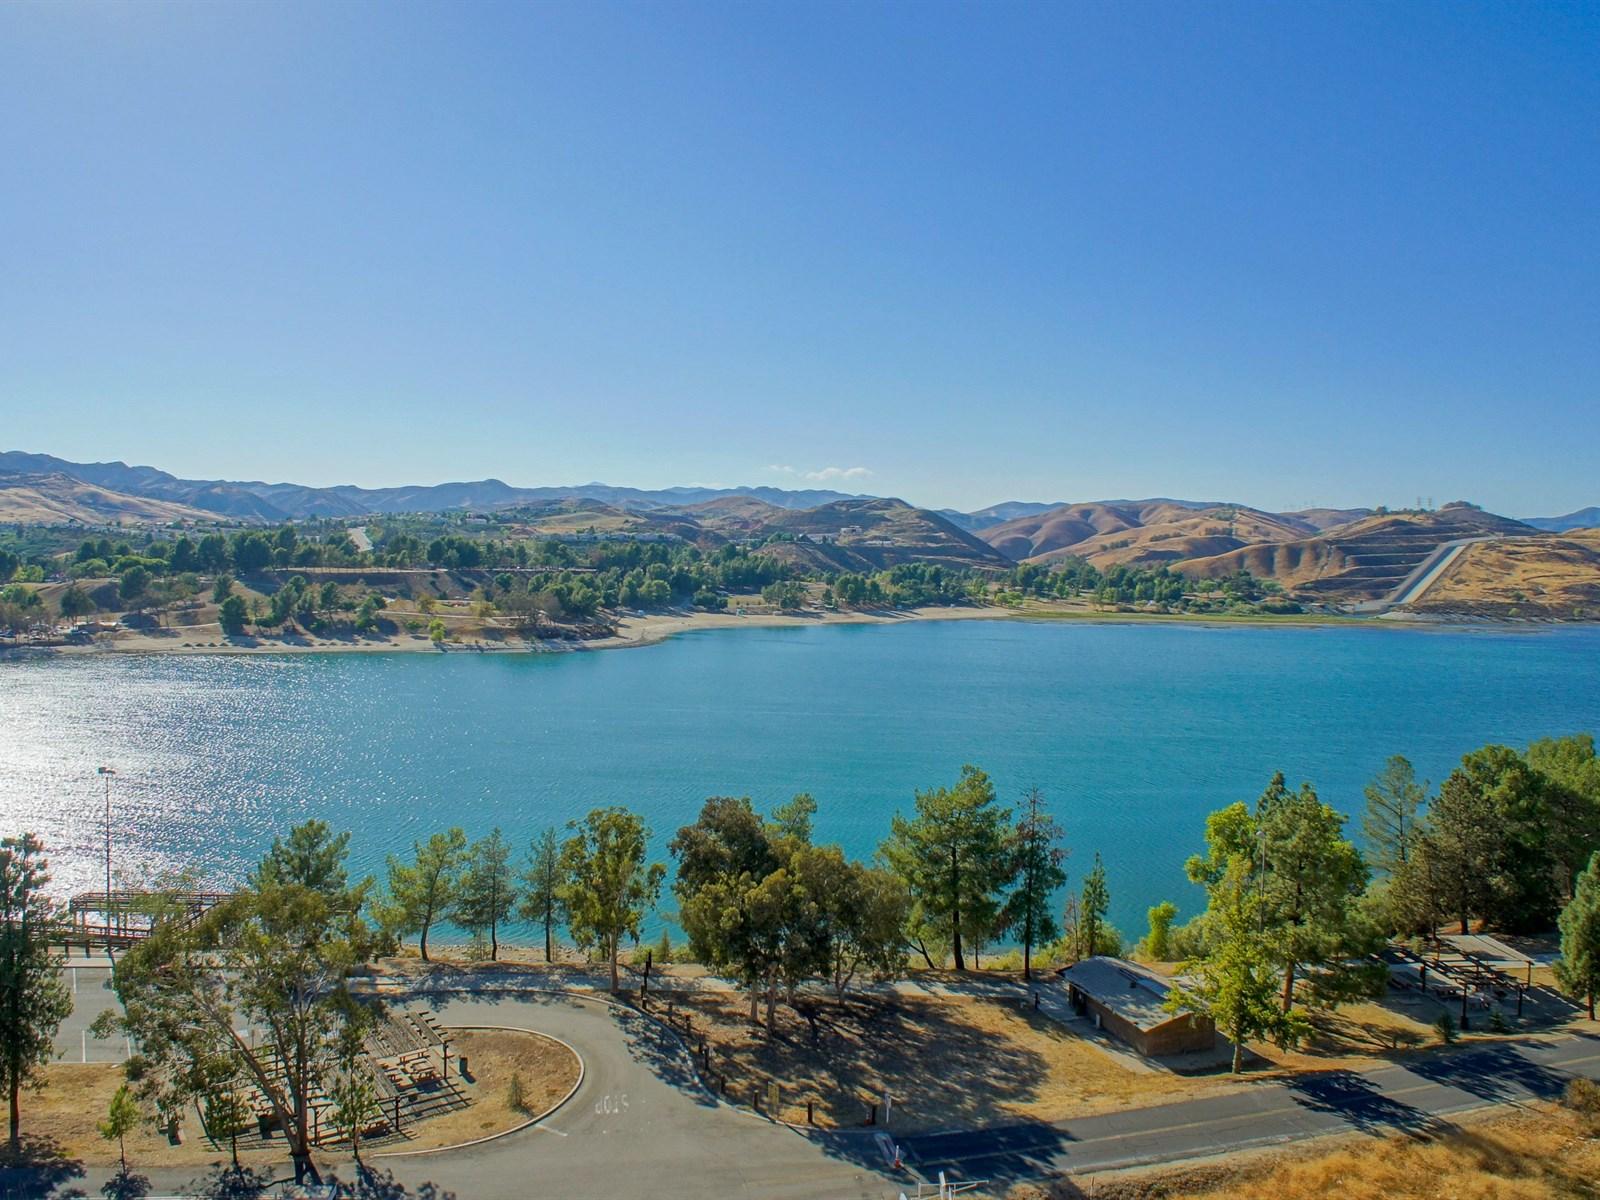 Lower Castaic Lagoon - Castaic Lake Recreation Area